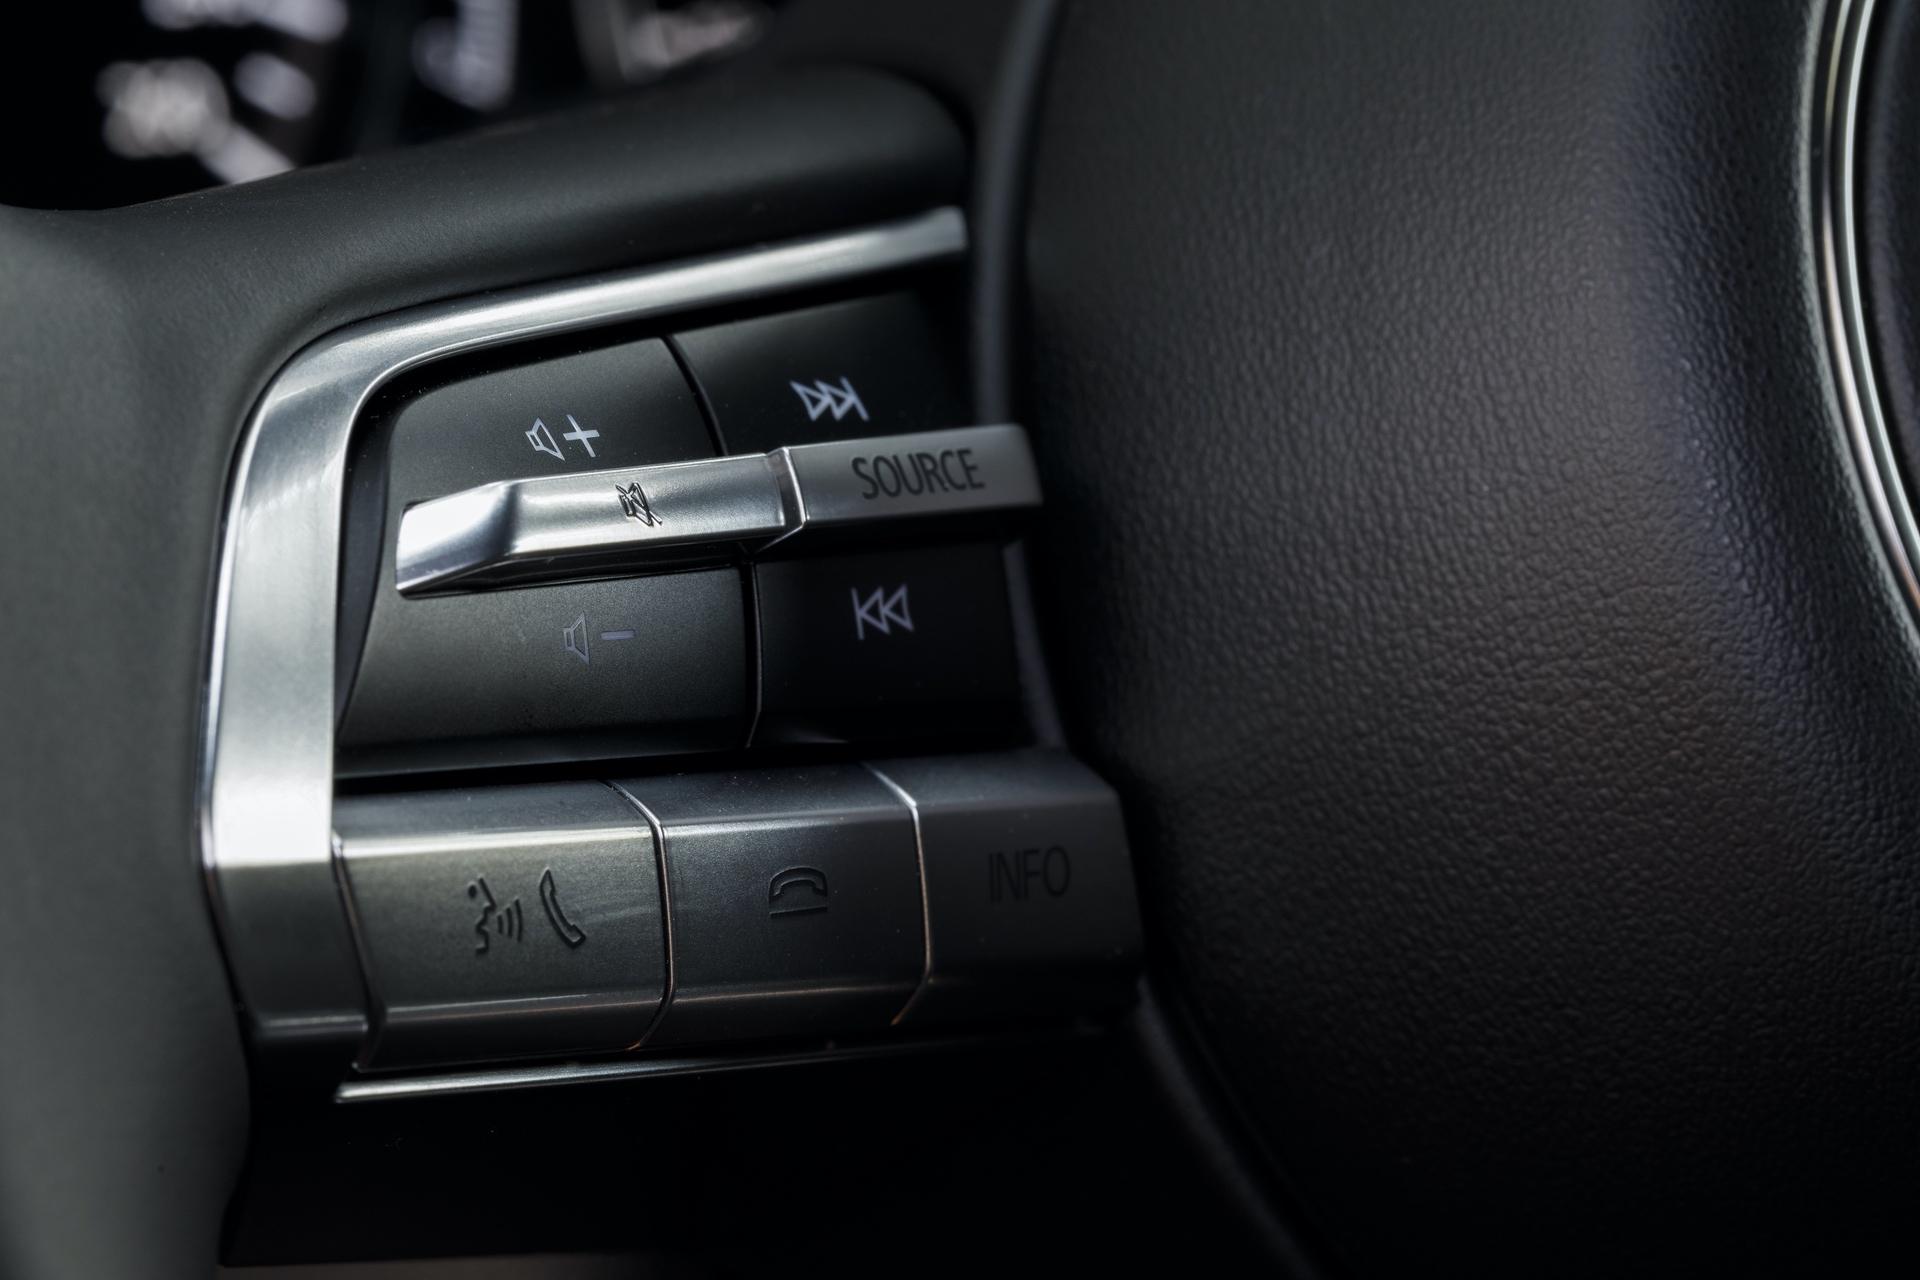 2019-Mazda3-Hatchback_32